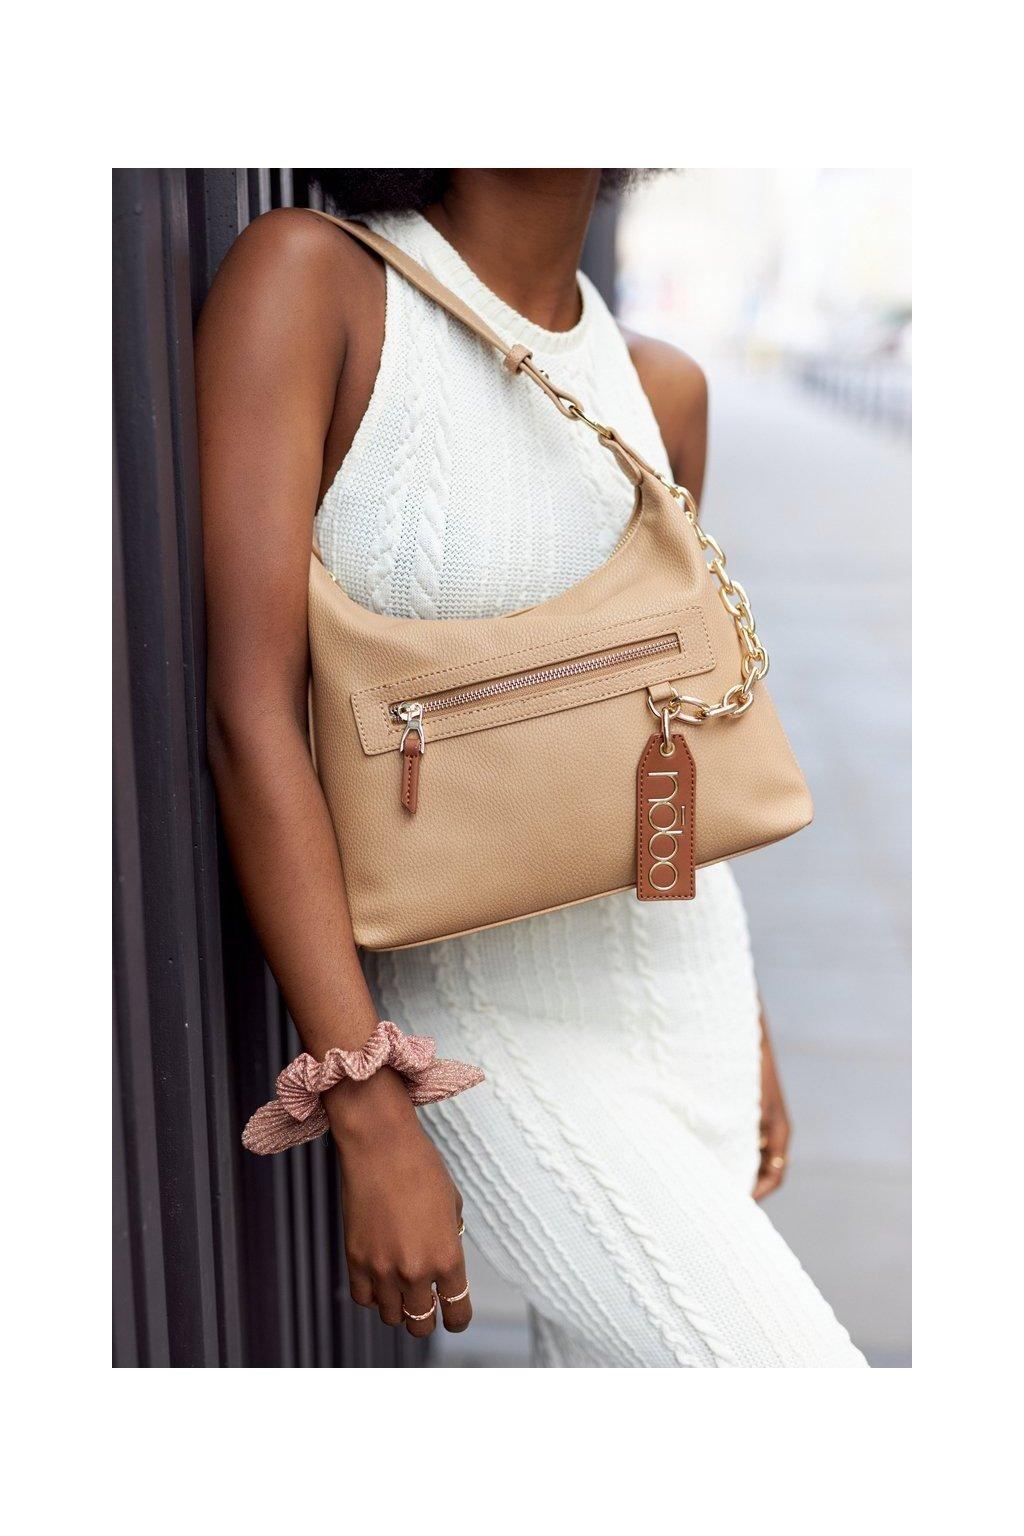 Dámska kabelka hnedá kód kabelky NBAG-K1820-C015 BEIGE